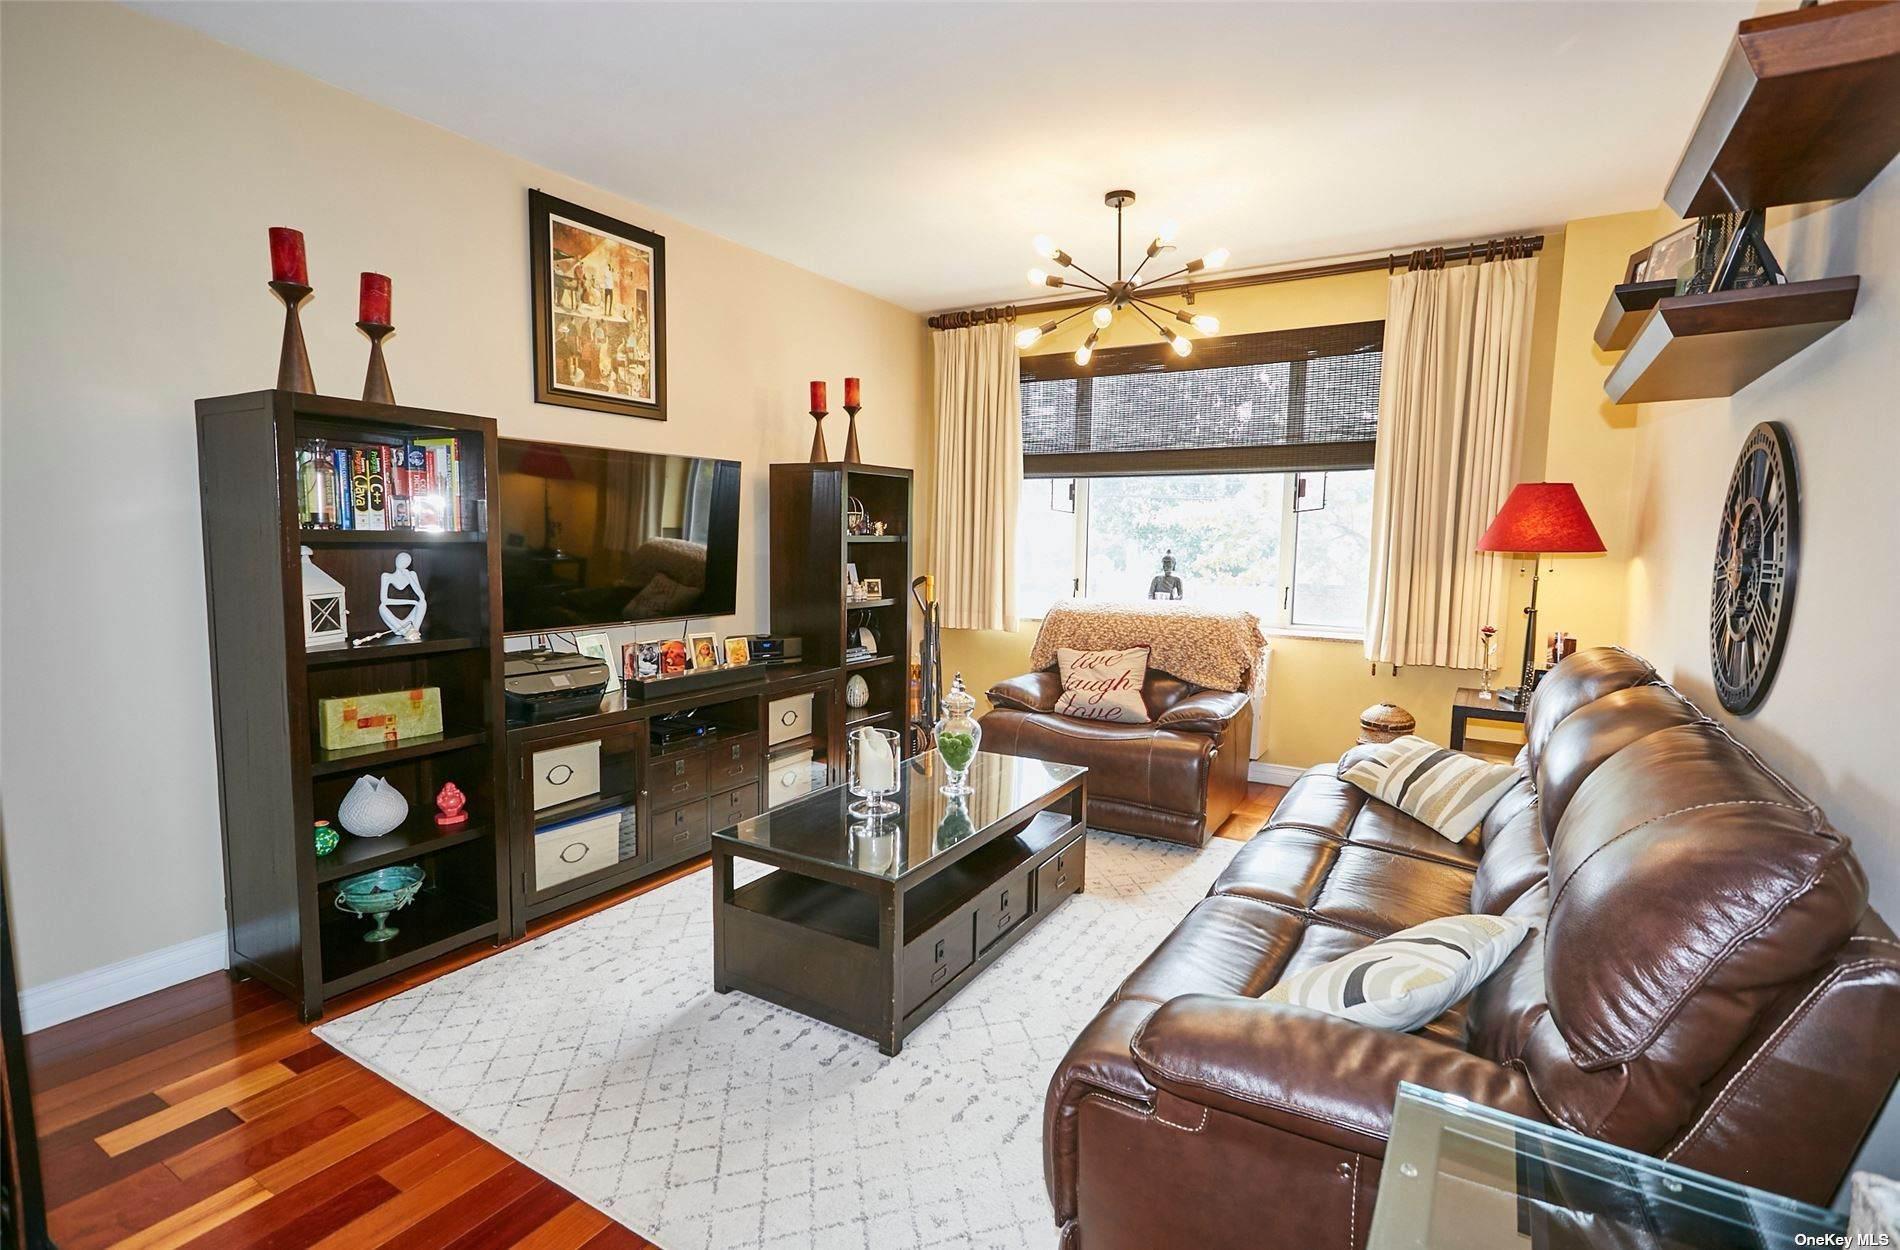 30-85 Vernon Boulevard 2F, Long Island City, NY 11102 (MLS #3348730) :: Kendall Group Real Estate   Keller Williams